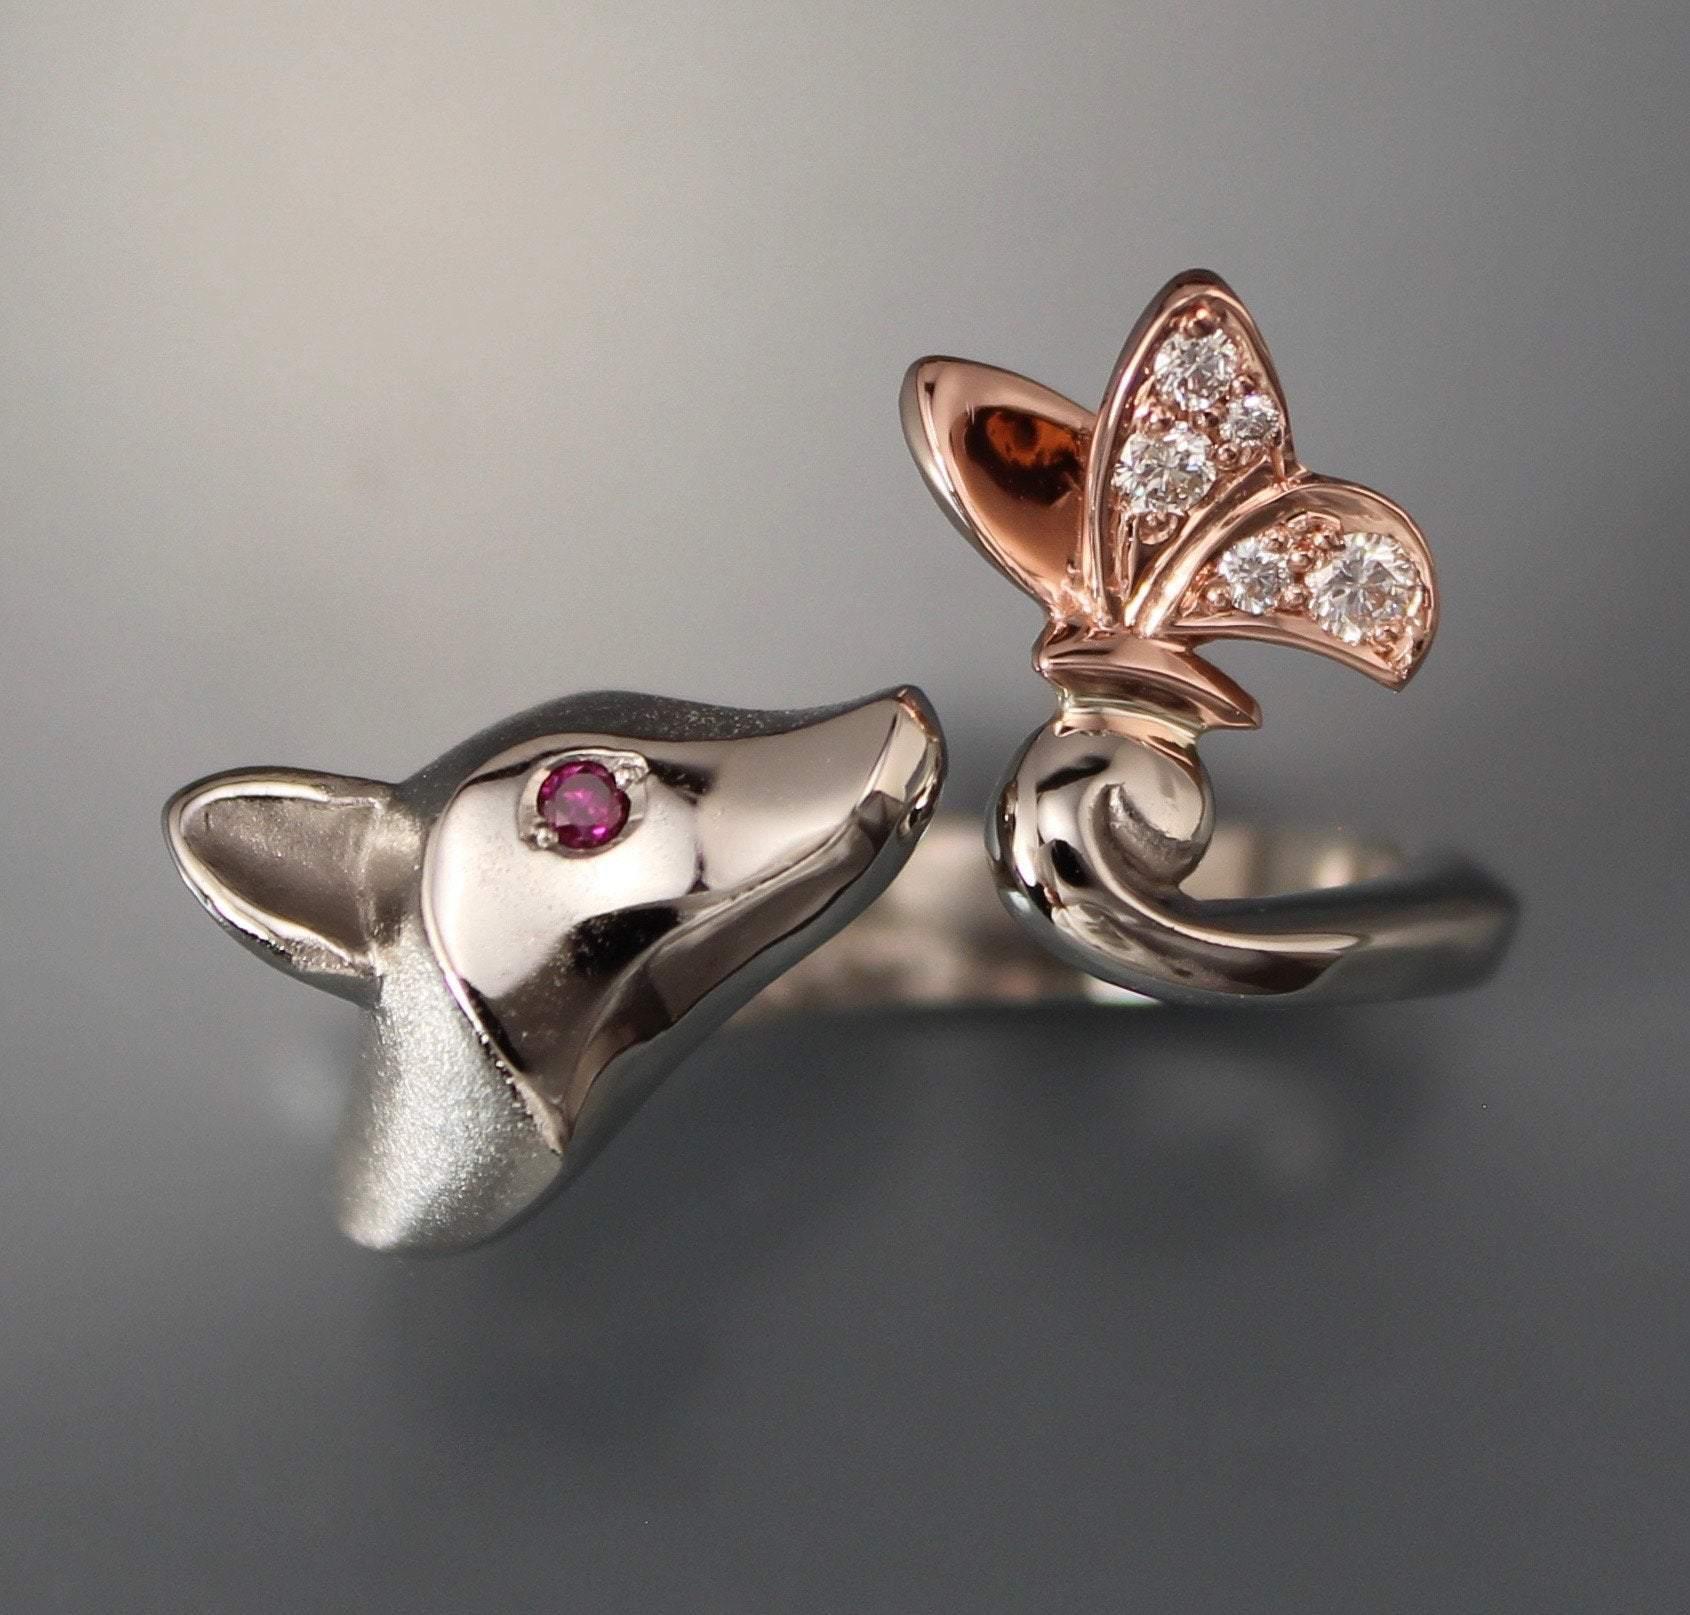 Michael Tatom Jewelry. Shanan Campbell. Sorrel Sky Gallery. Art Advisor. Art Consultant. Corporate Art. Private Art Collection. Santa Fe Art Gallery.